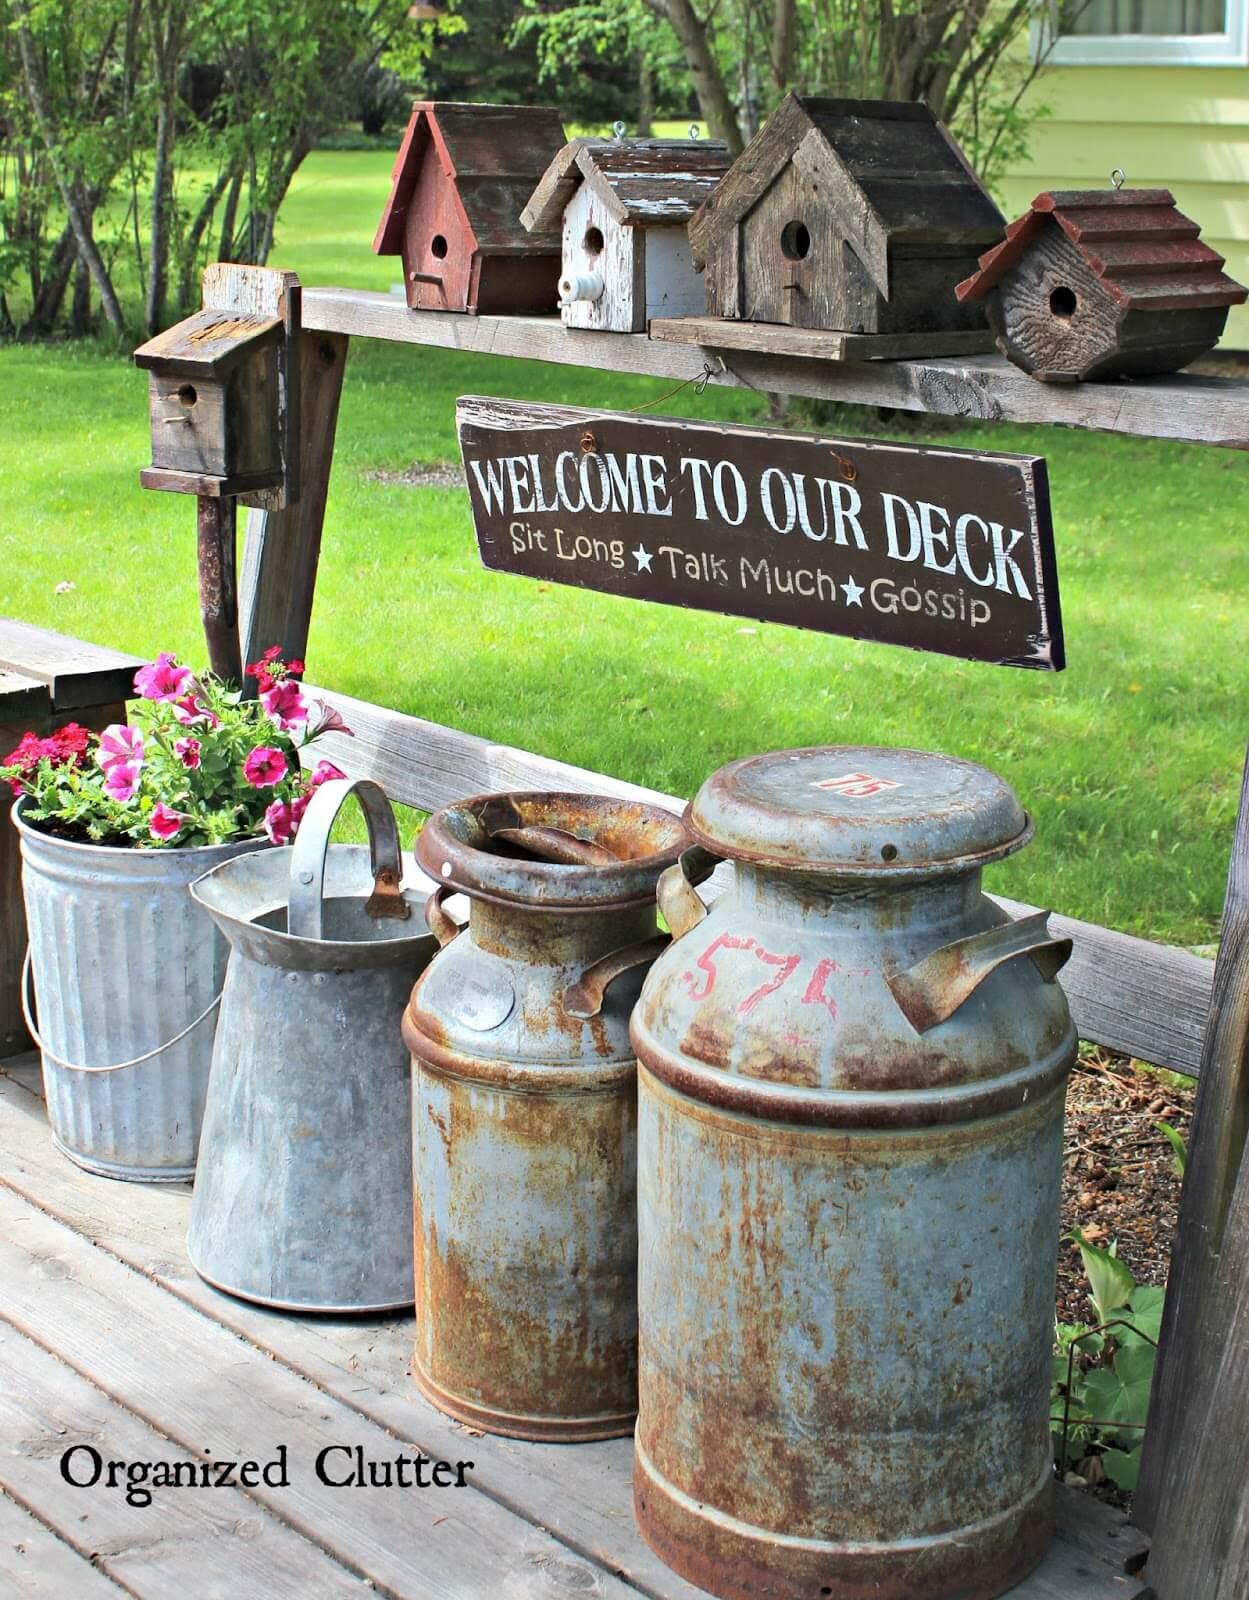 Vintage Birdhouse and Milk Can Decor Idea